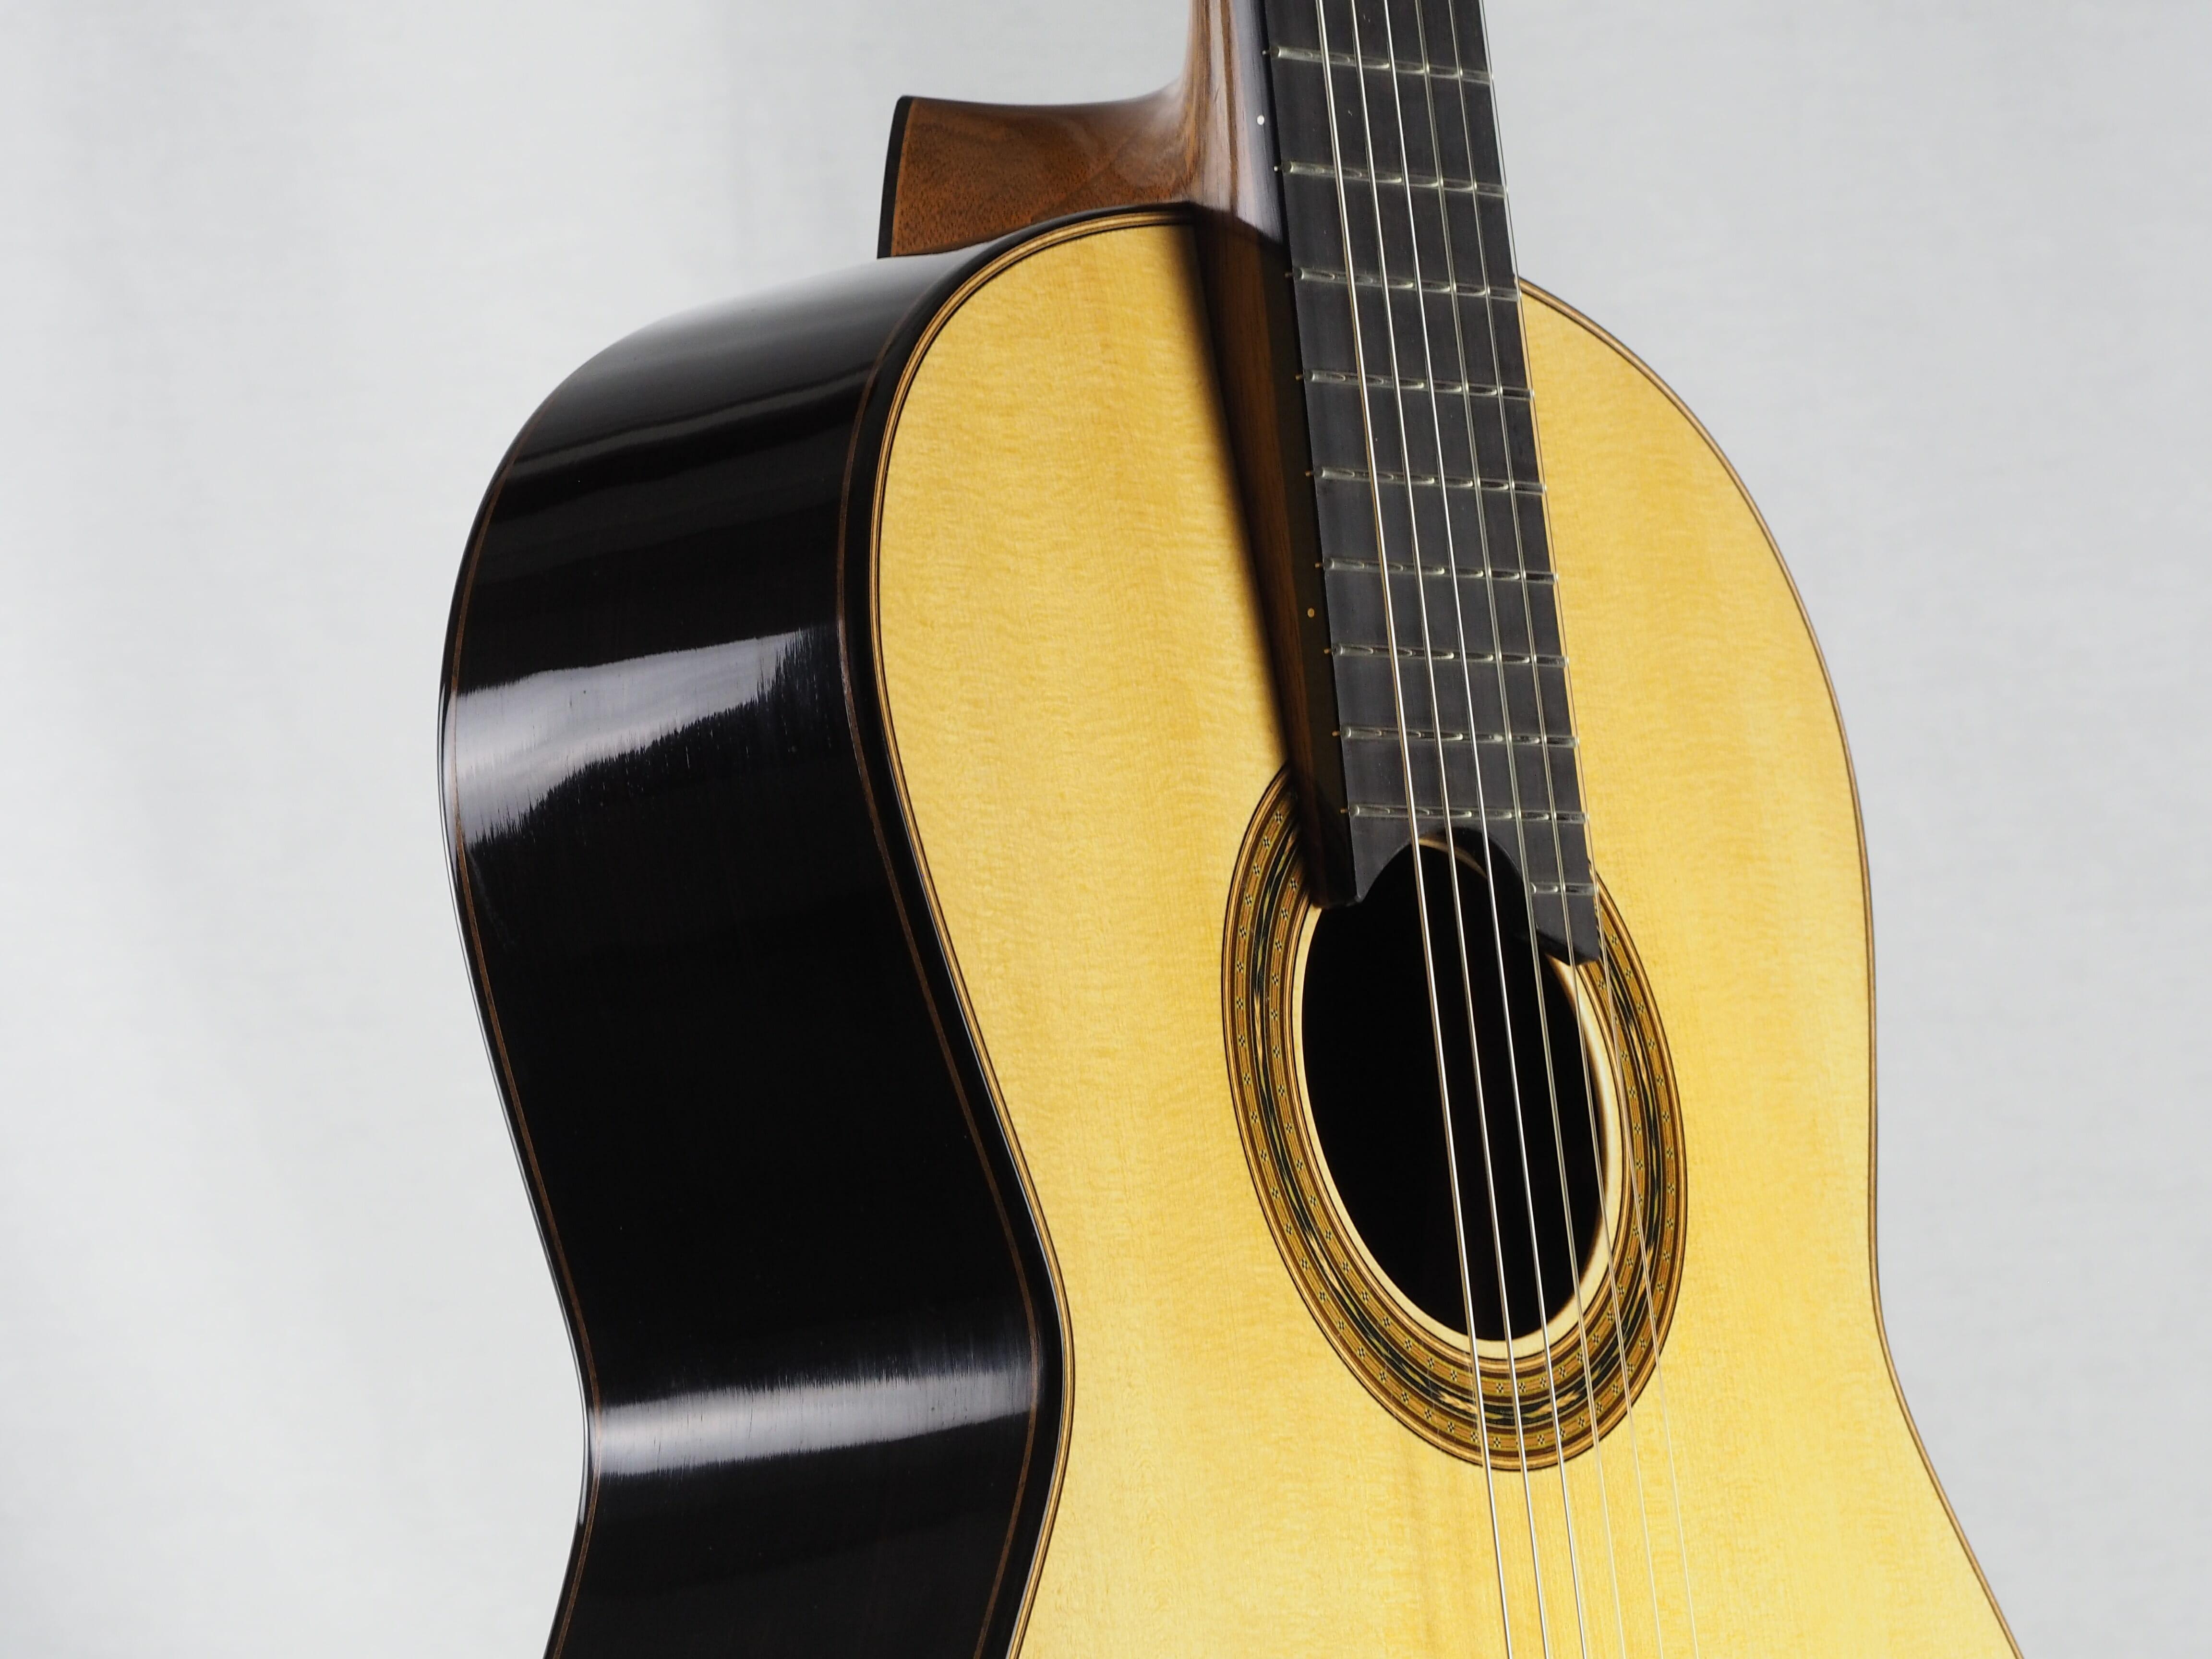 Gregory Byers guitare classique 3